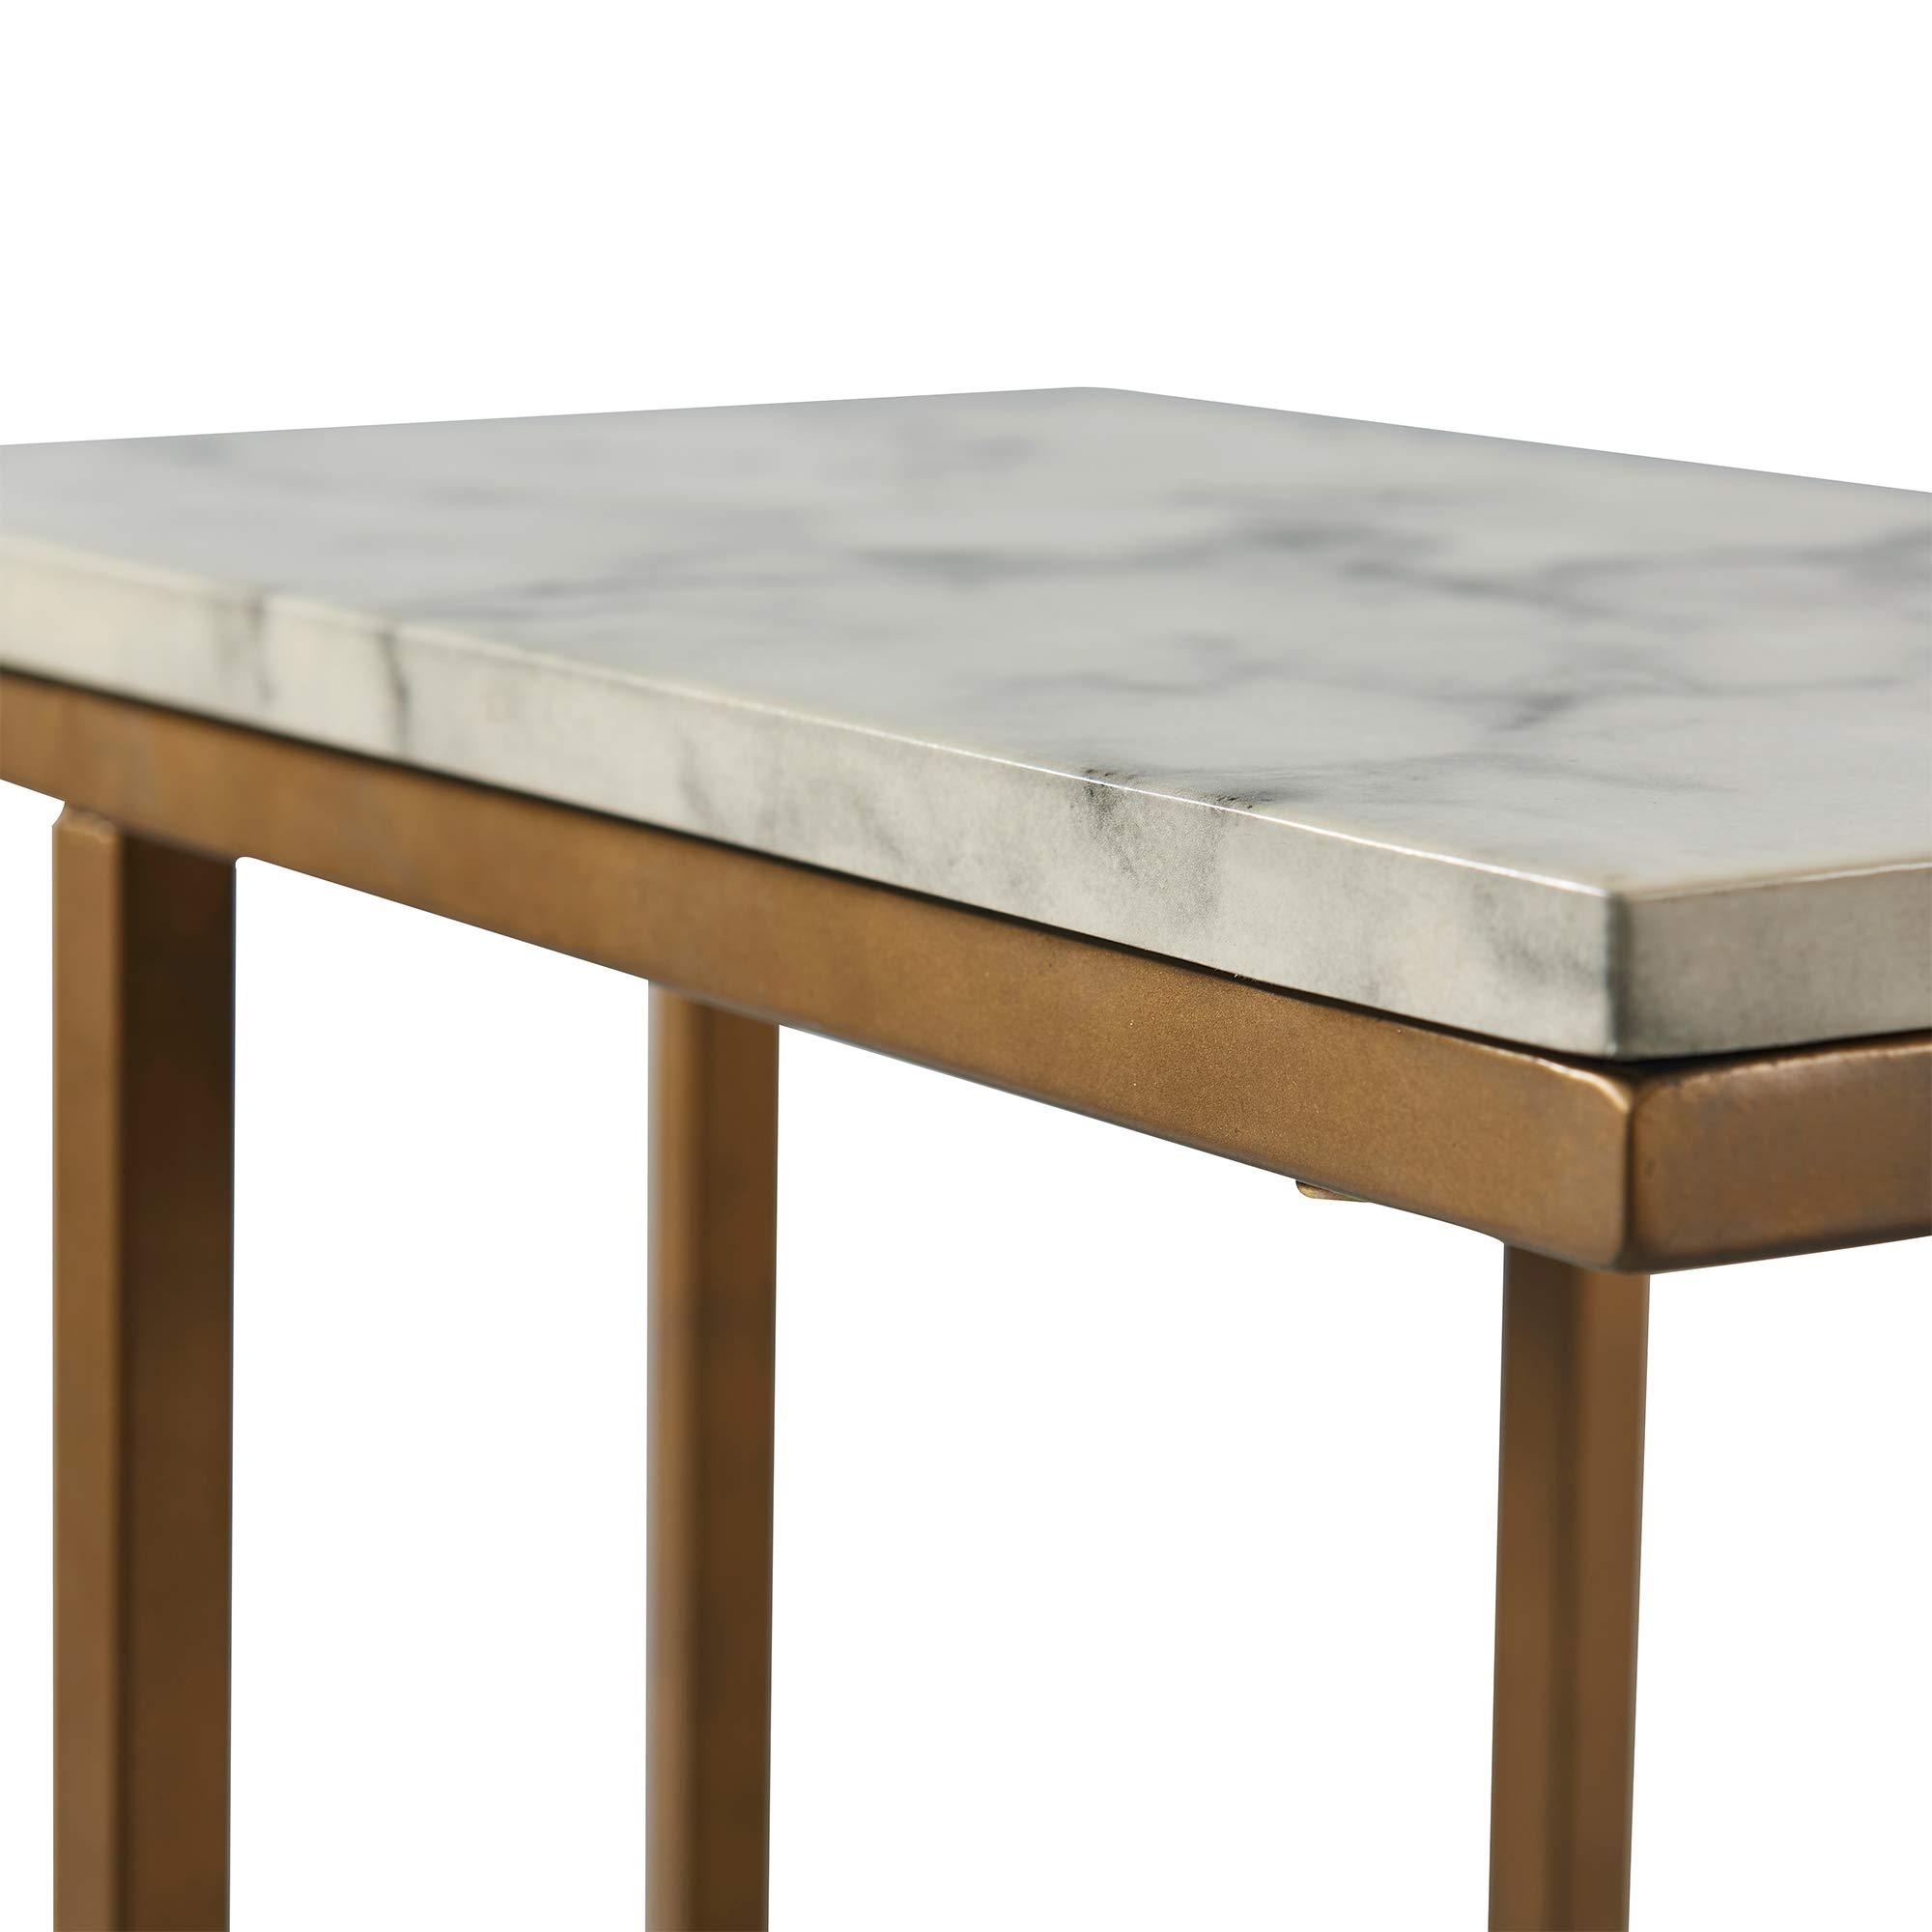 Versanora - Marmo C Shape Table - Faux Marble /Brass by Versanora (Image #8)